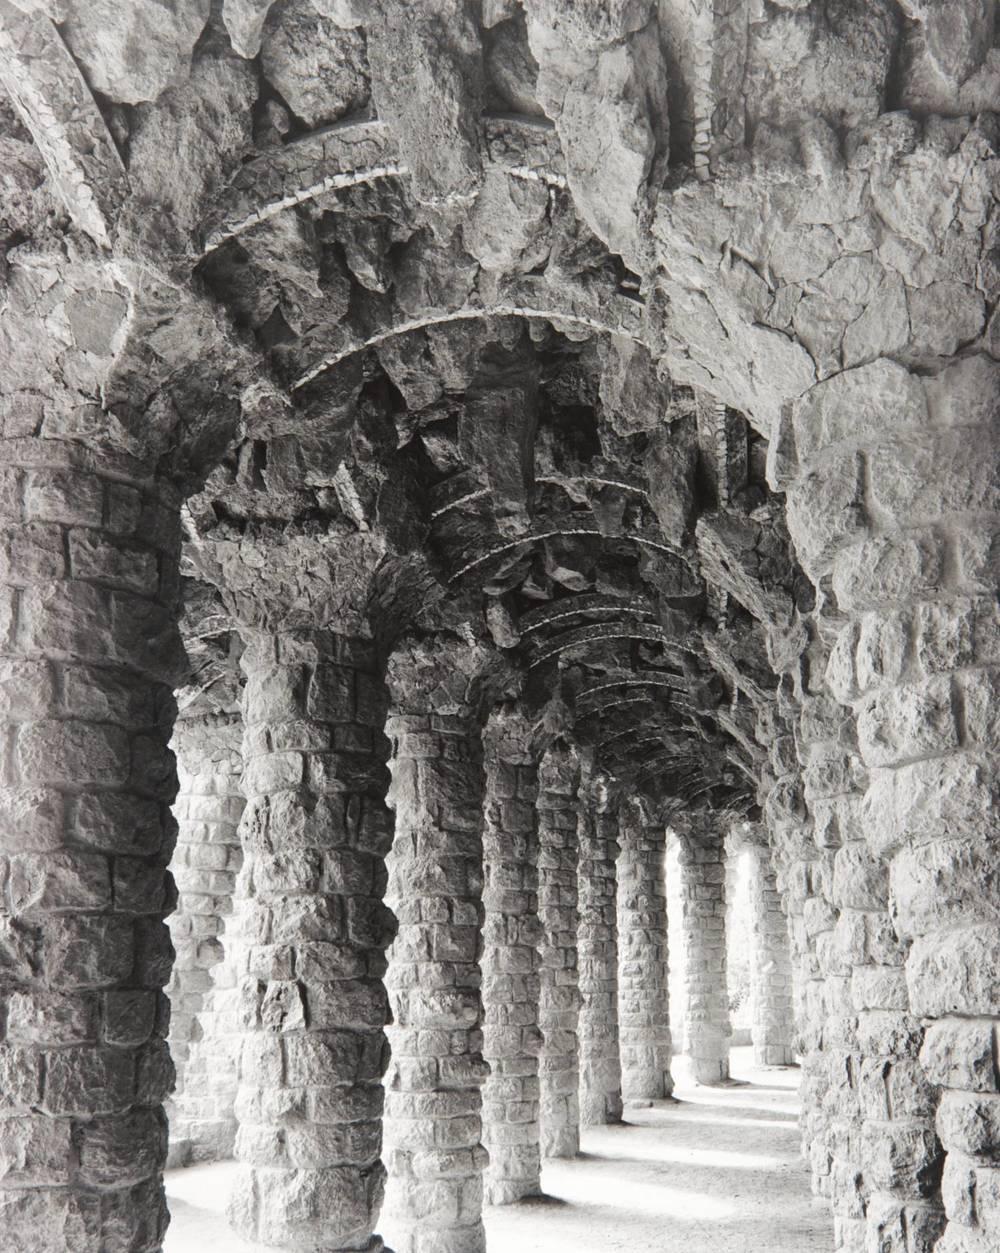 Gaudi Pillars (Park Güell, Barcelona, Spain)